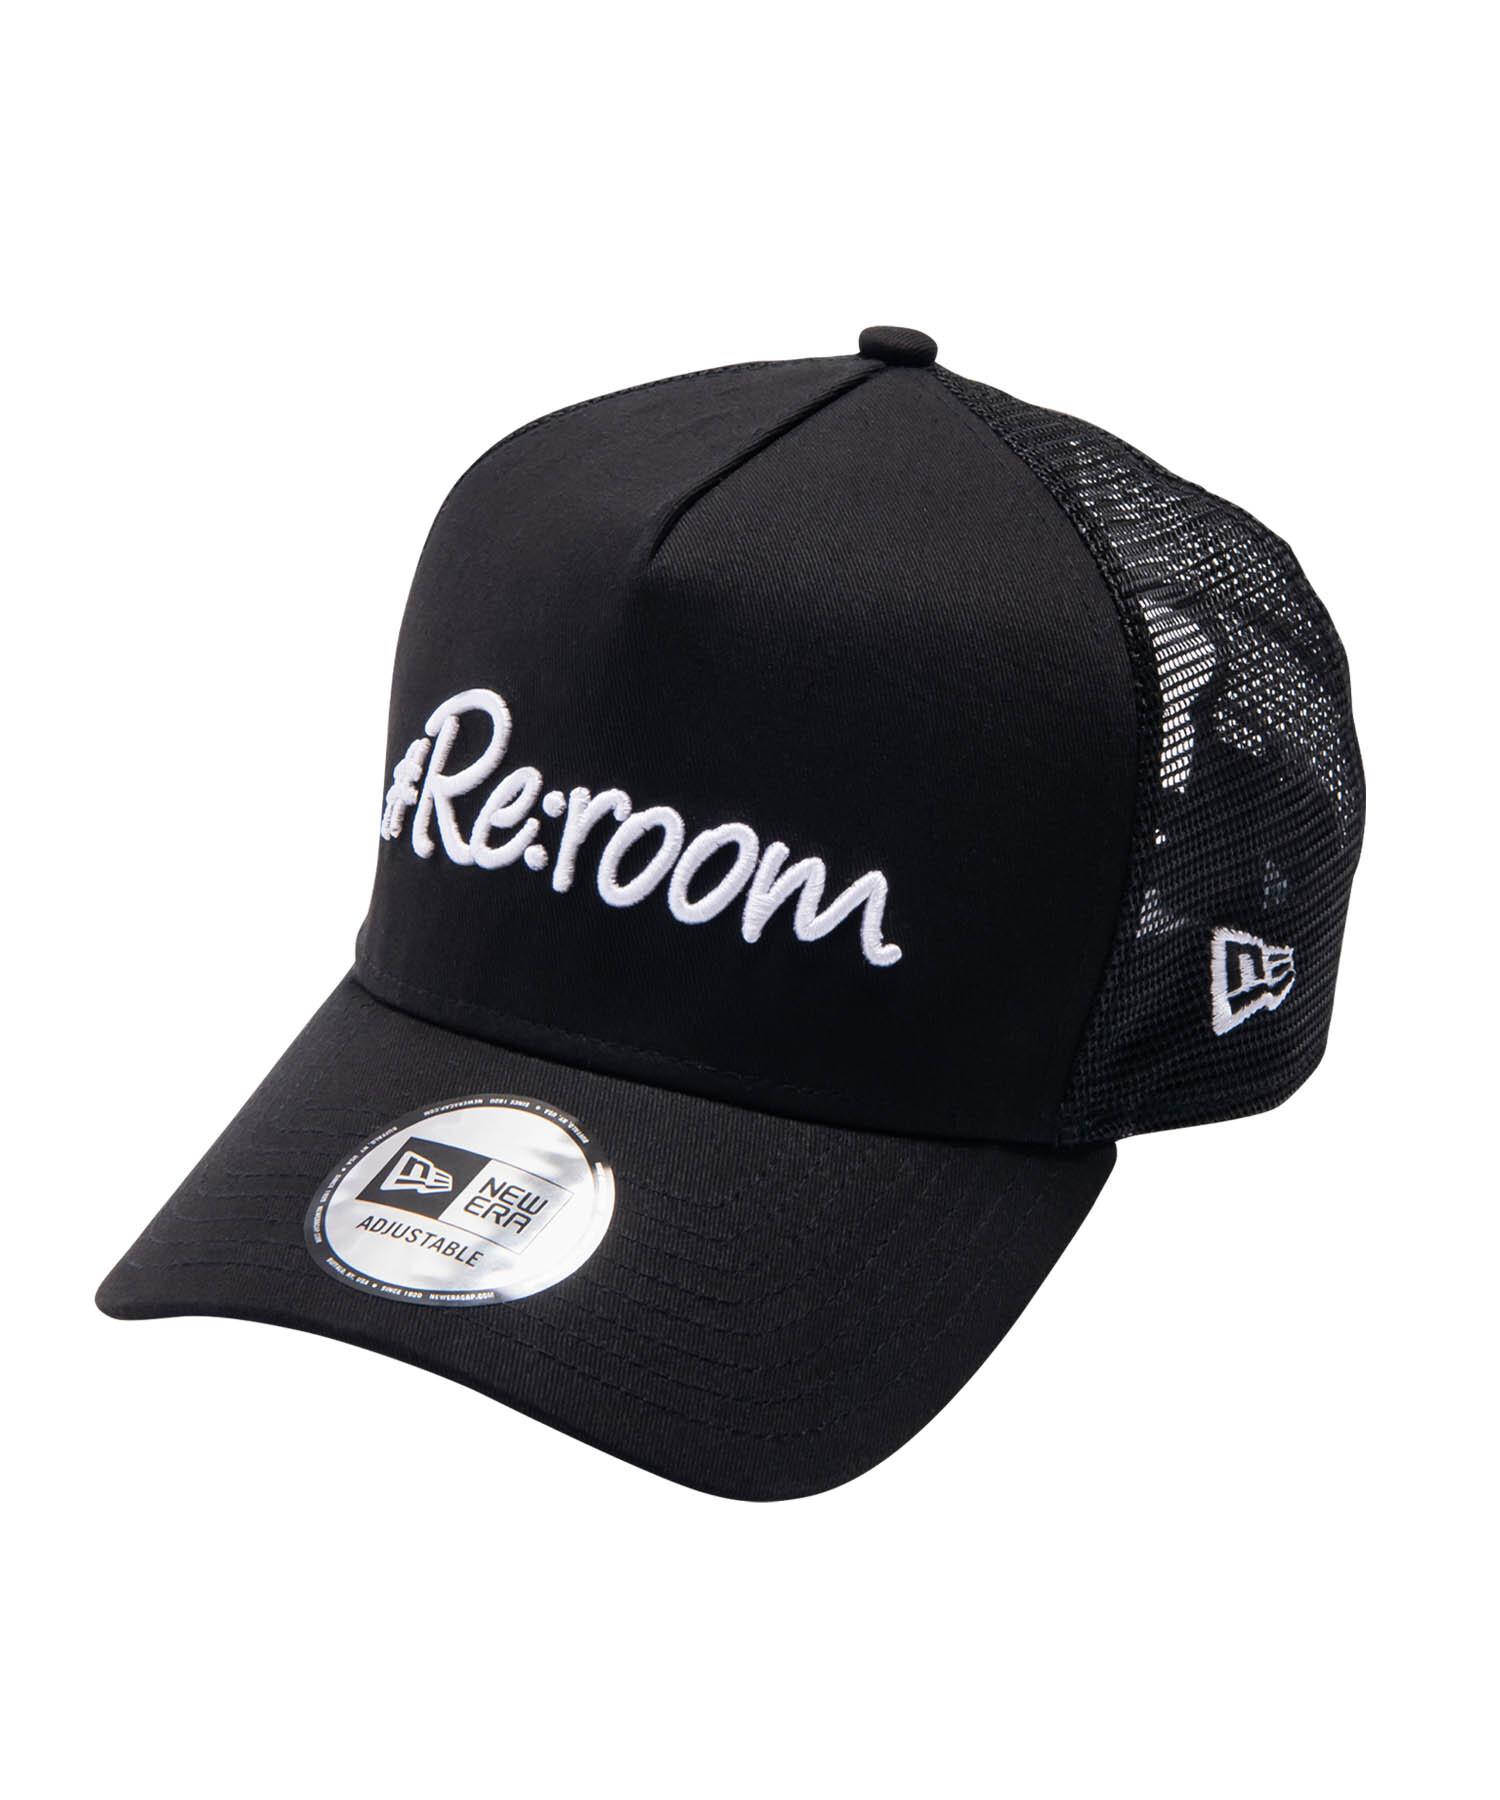 #Re:room×NEW ERA 9FORTY™ Original Fit[REH106]